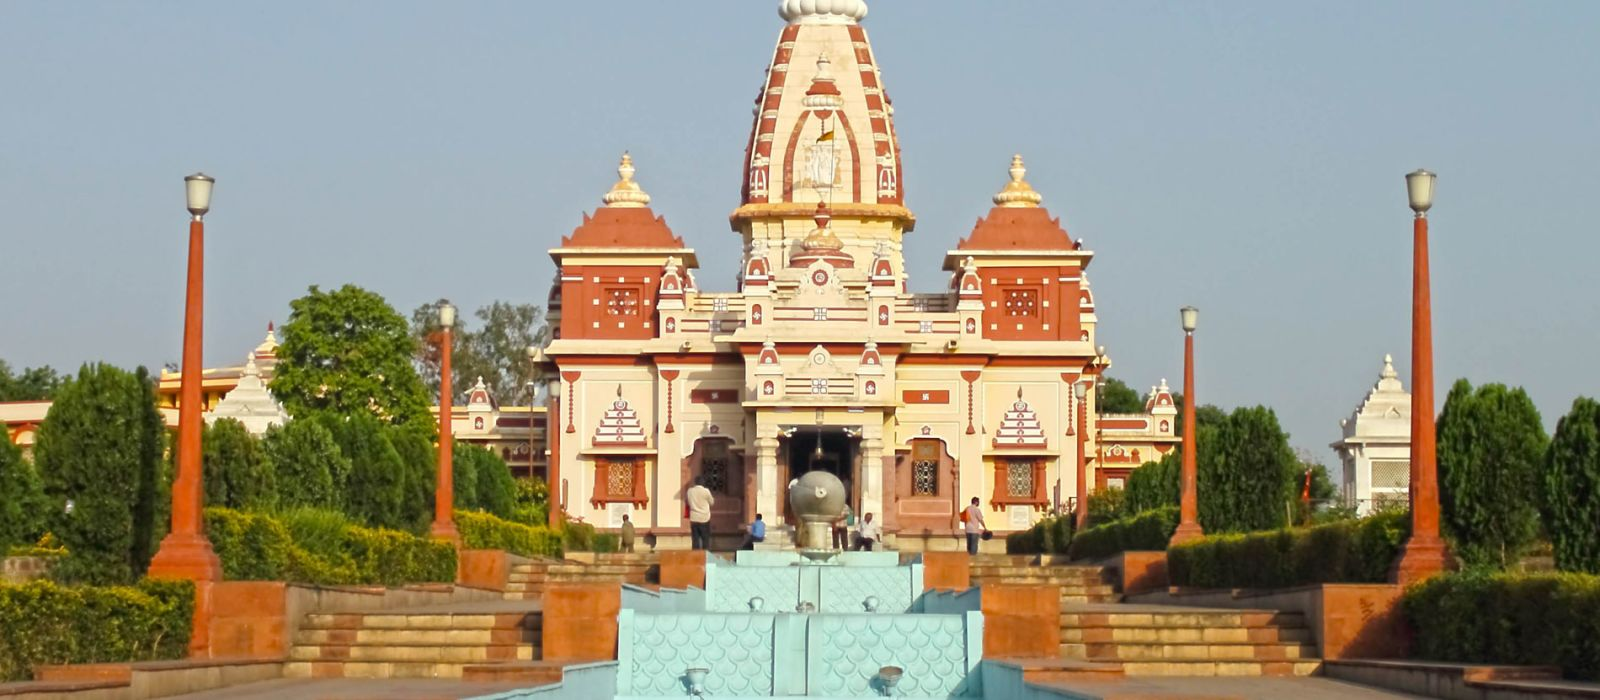 Reiseziel Bhopal Zentral- & Westindien